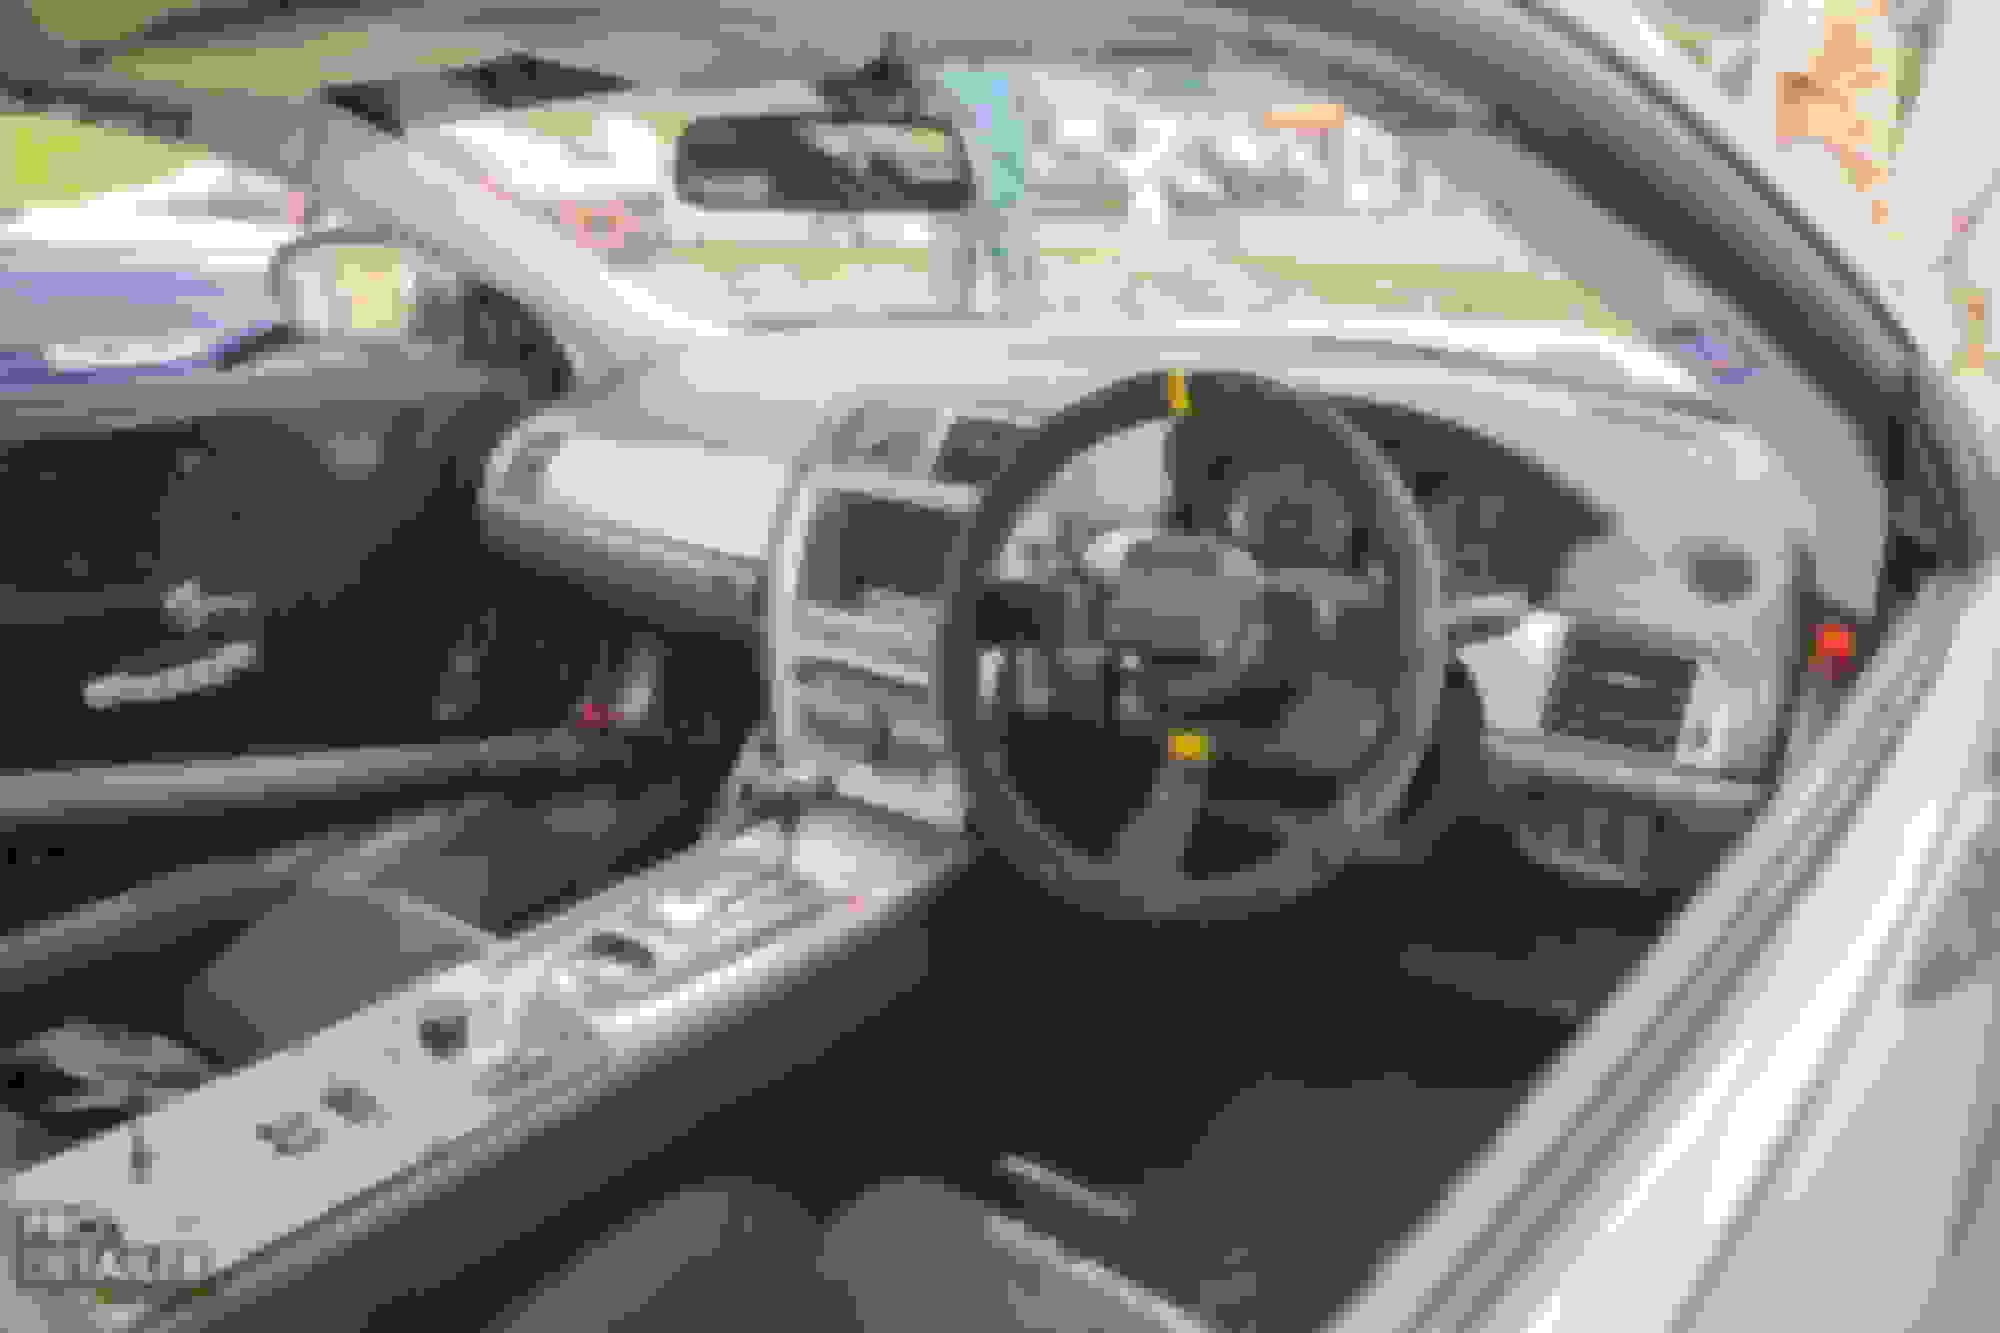 Xk8 Xkr How To Diy Repair Maintenance Links Facts Data Jaguar Forums Jaguar Enthusiasts Forum